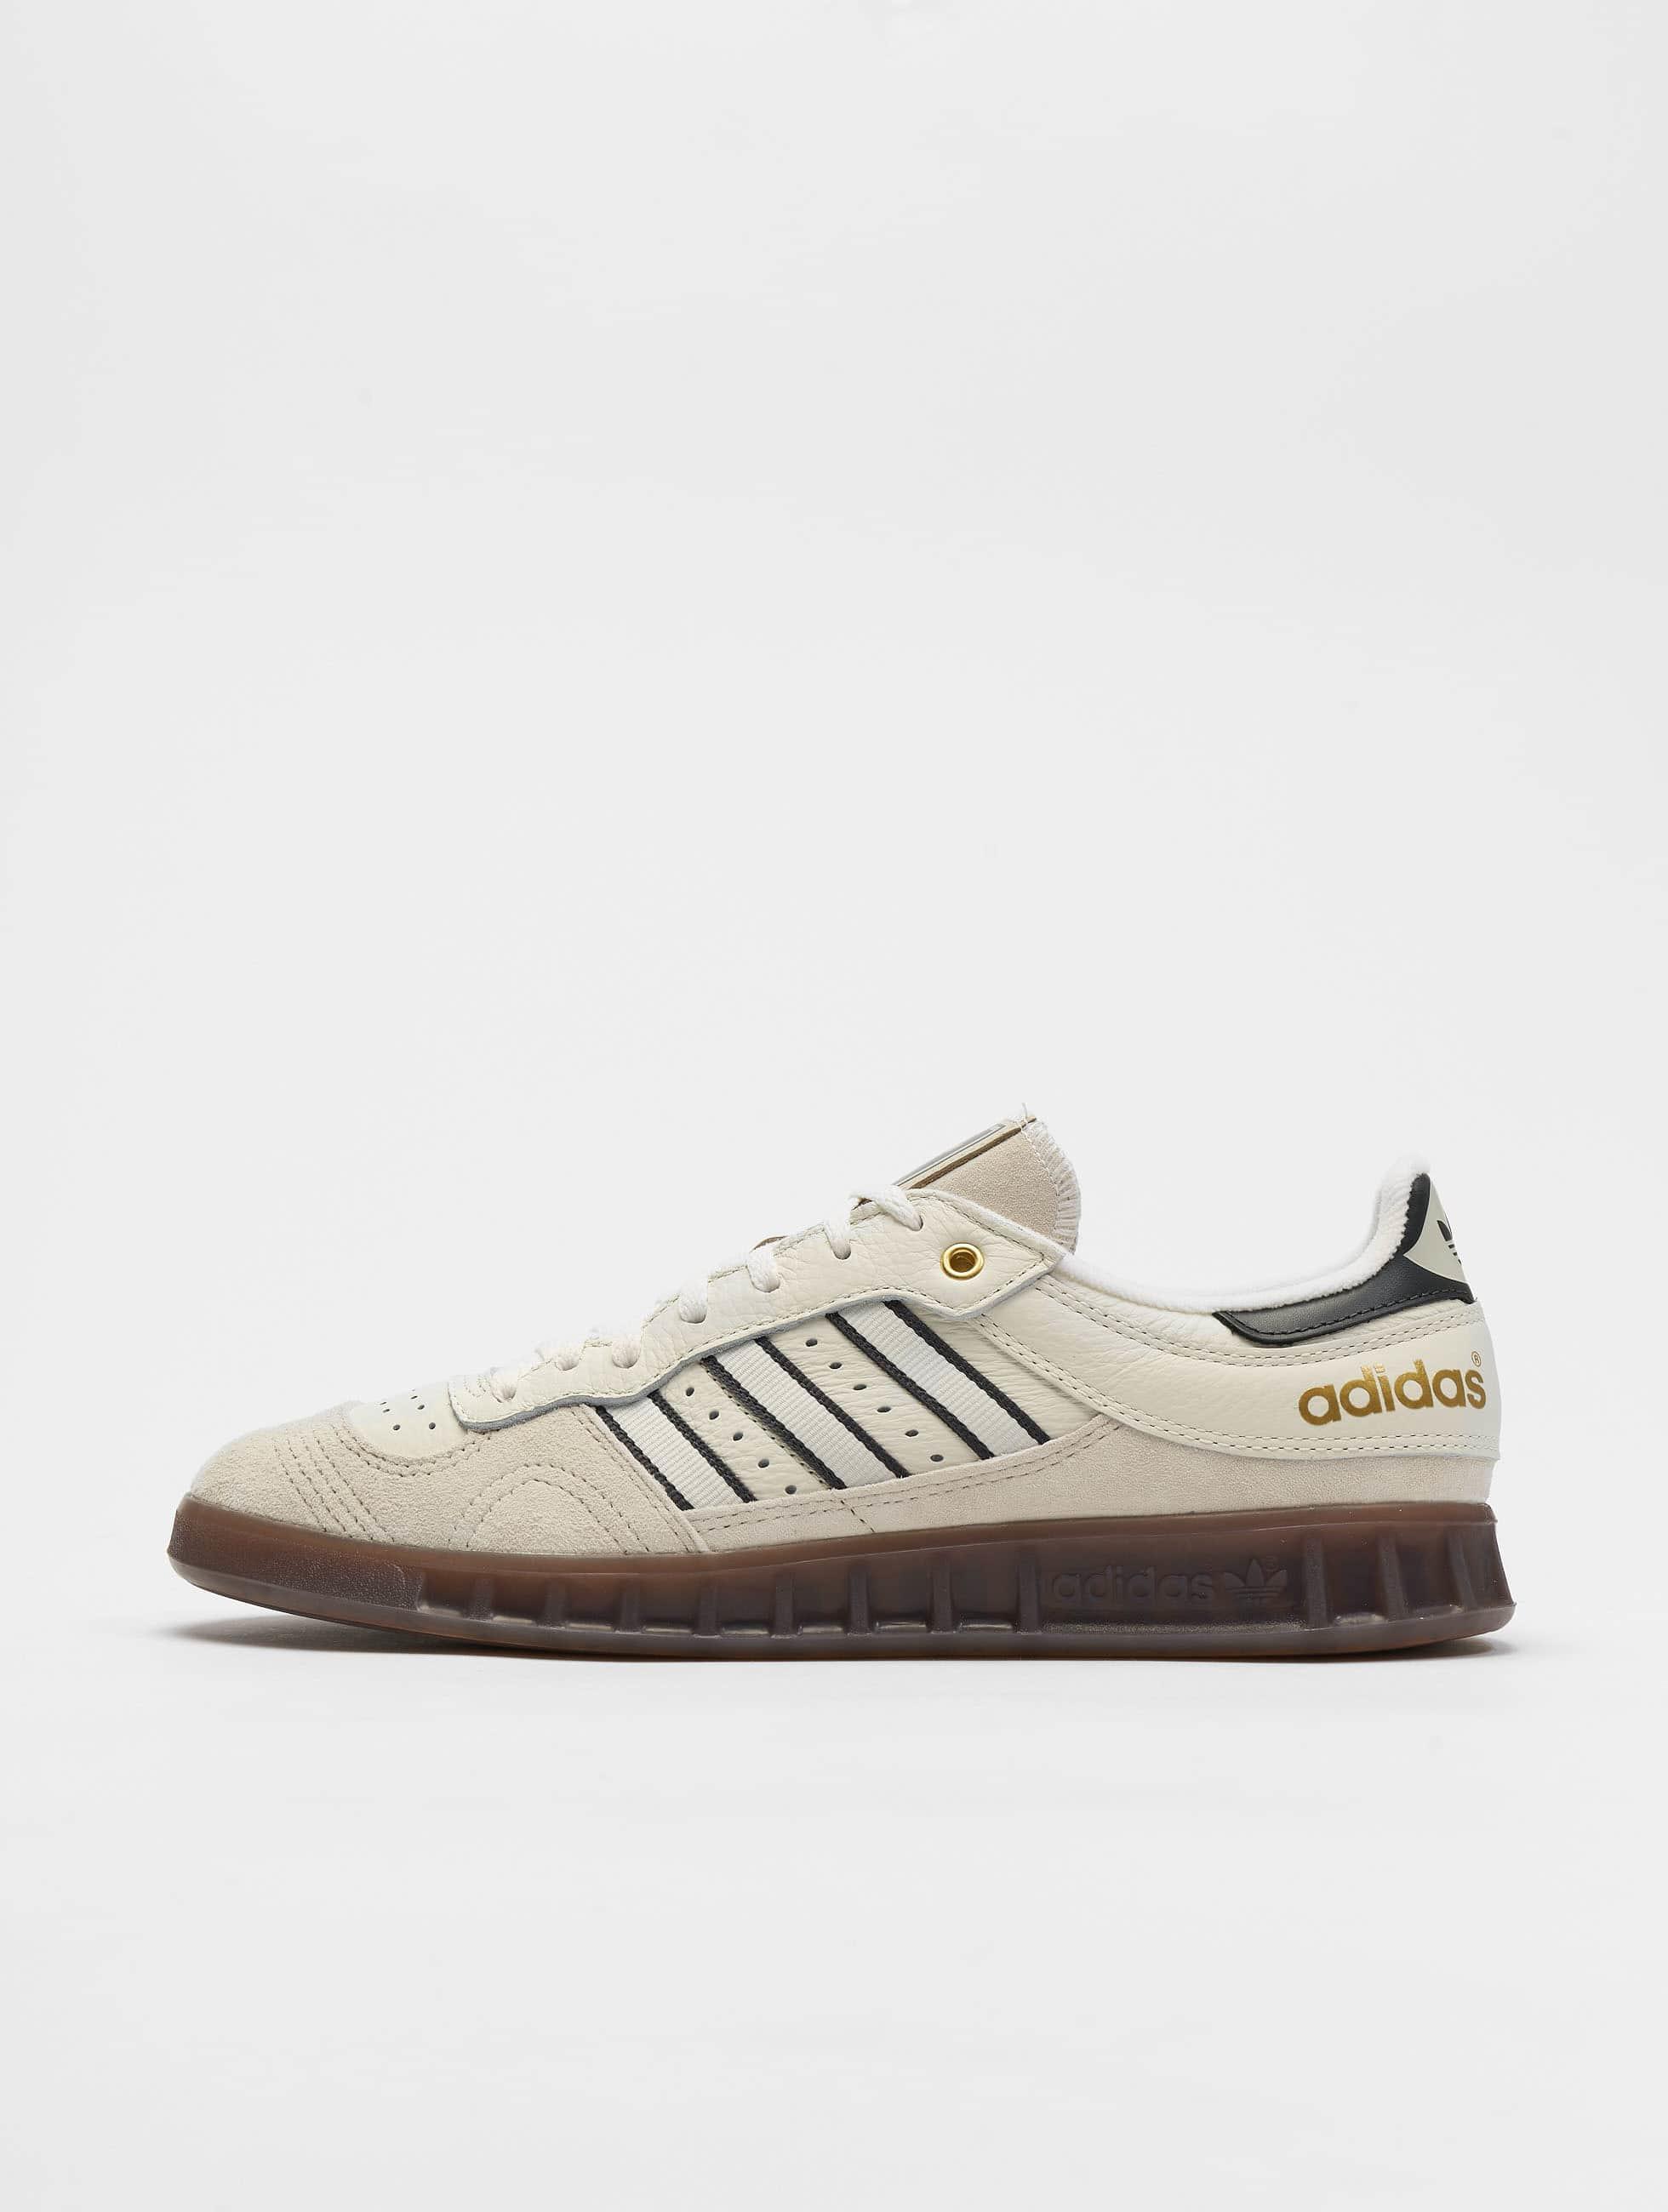 Adidas Handball Originals Top Sneakers Owhitecarboncbrown Qsrdth